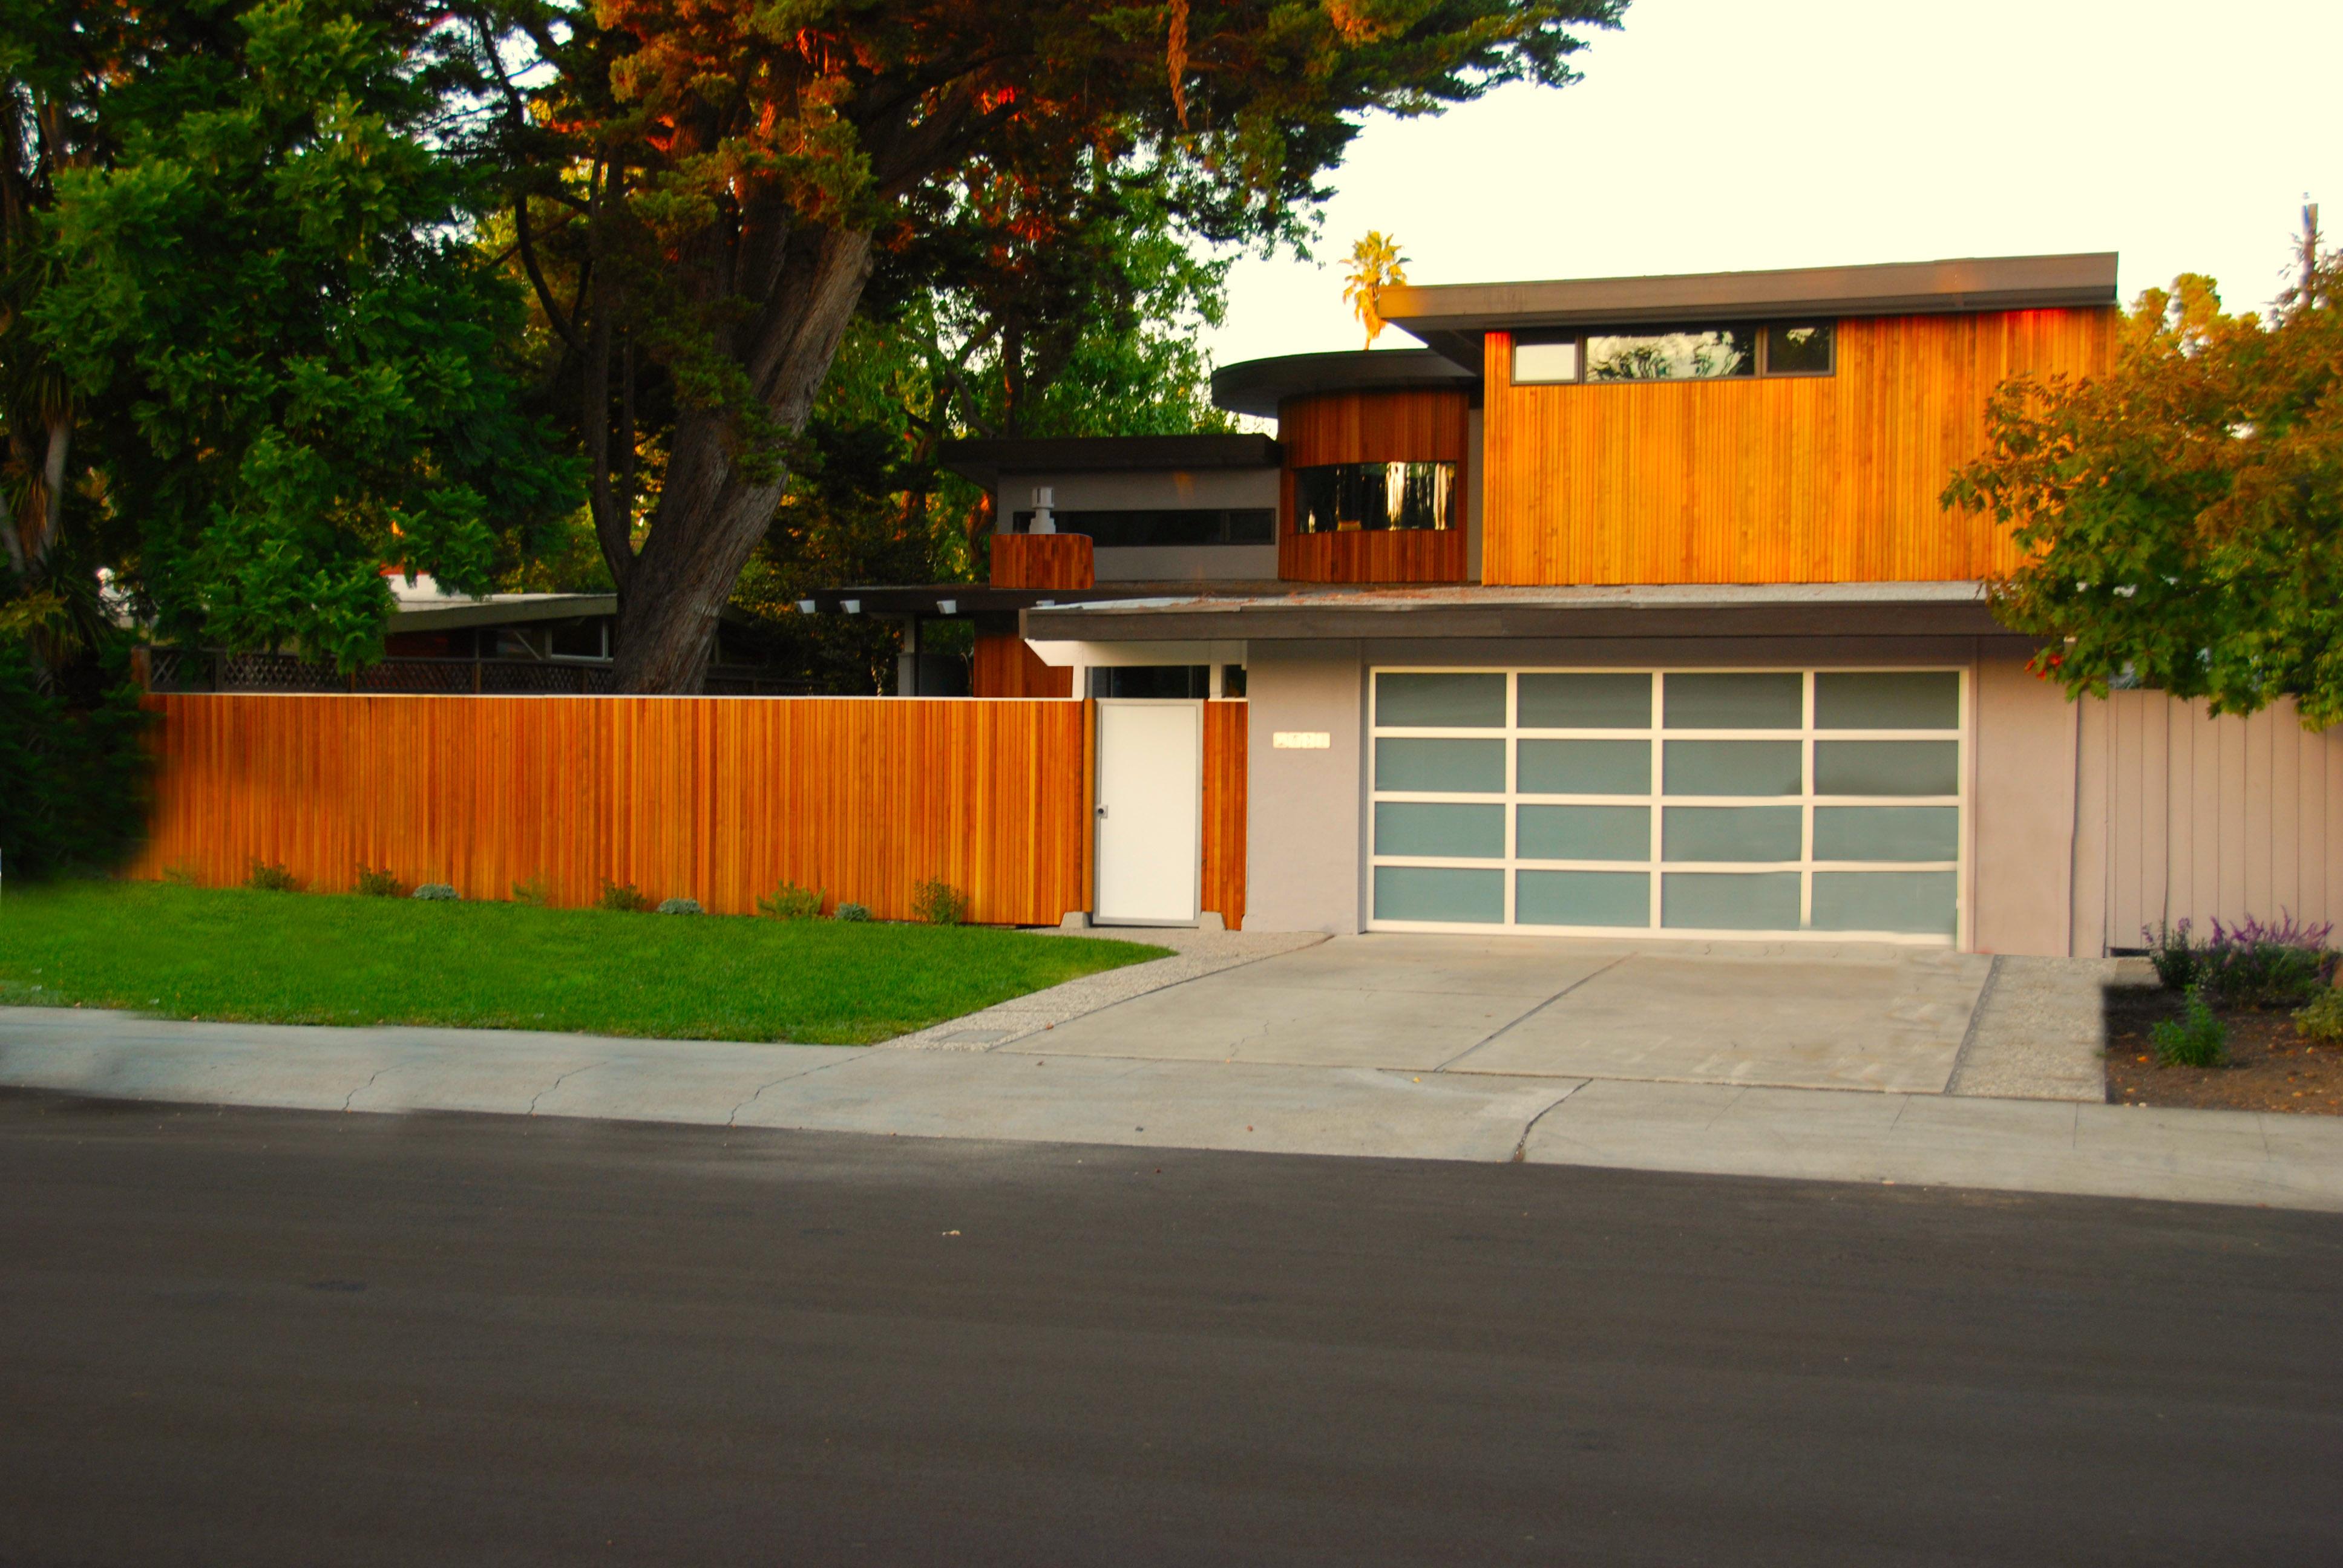 Palo Alto Mdesign